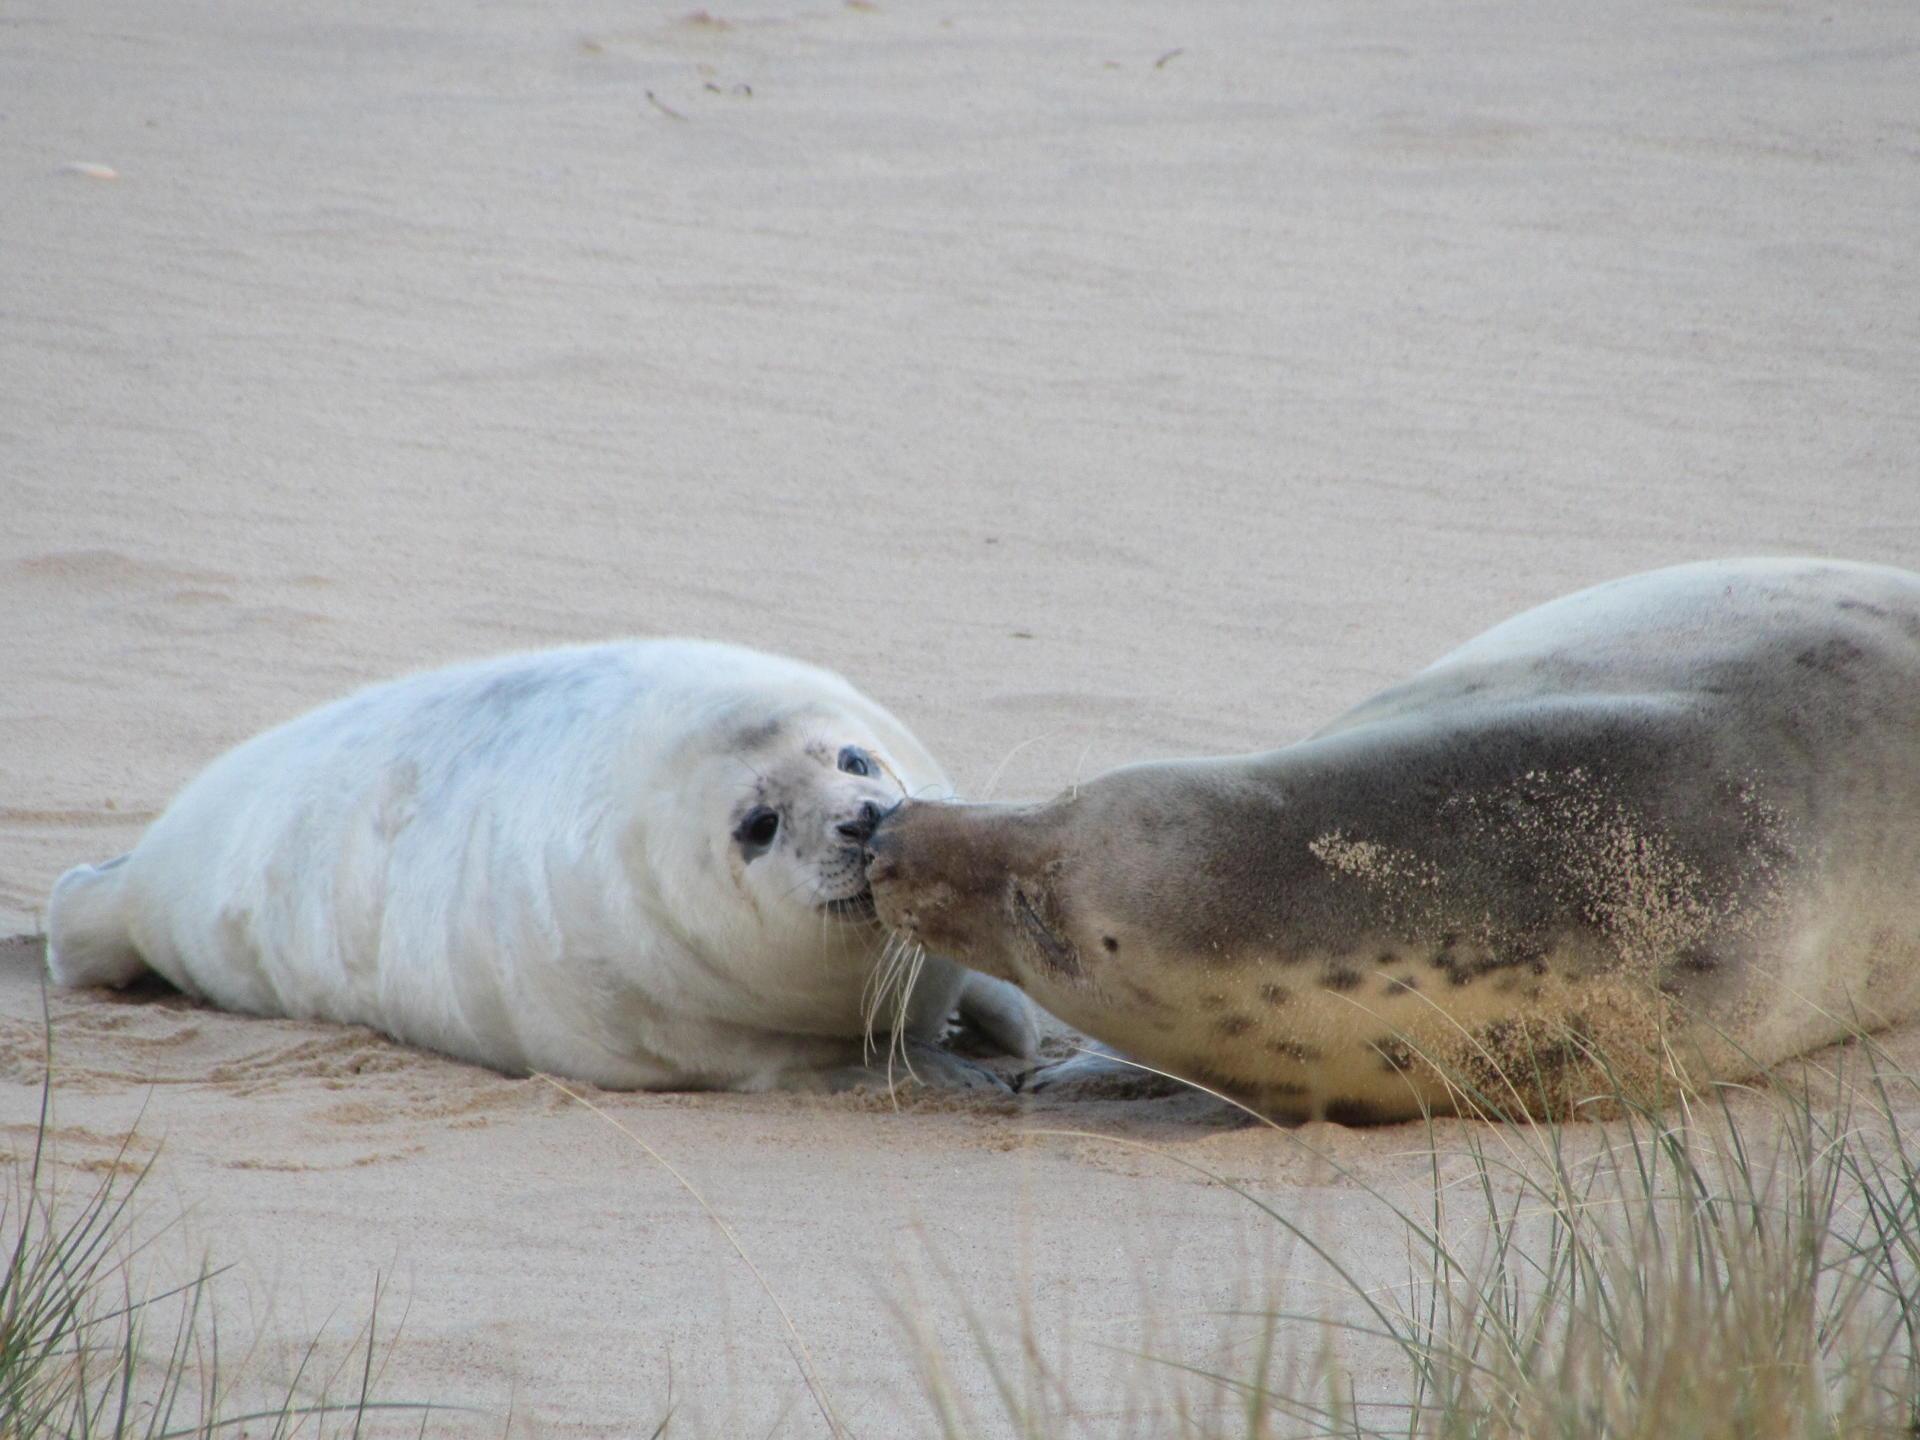 Seal Watching in North Norfolk - Yesihaveablog   Seals of Horsey Gap   Norfolk - Life in a Fine City   Winterlust